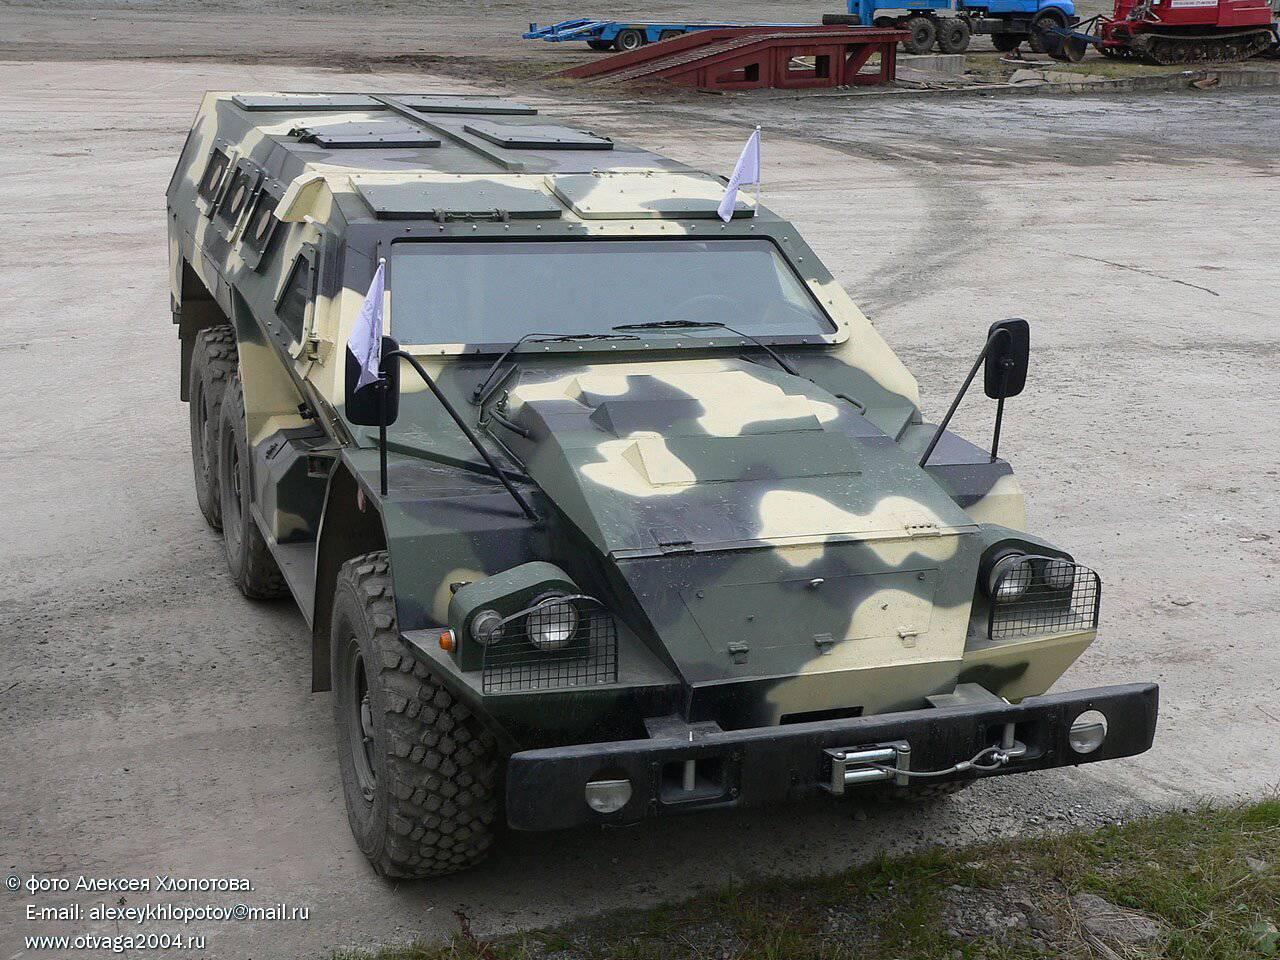 http://topwar.ru/uploads/posts/2012-08/1346395733_otvaga2004_xl_039.jpg